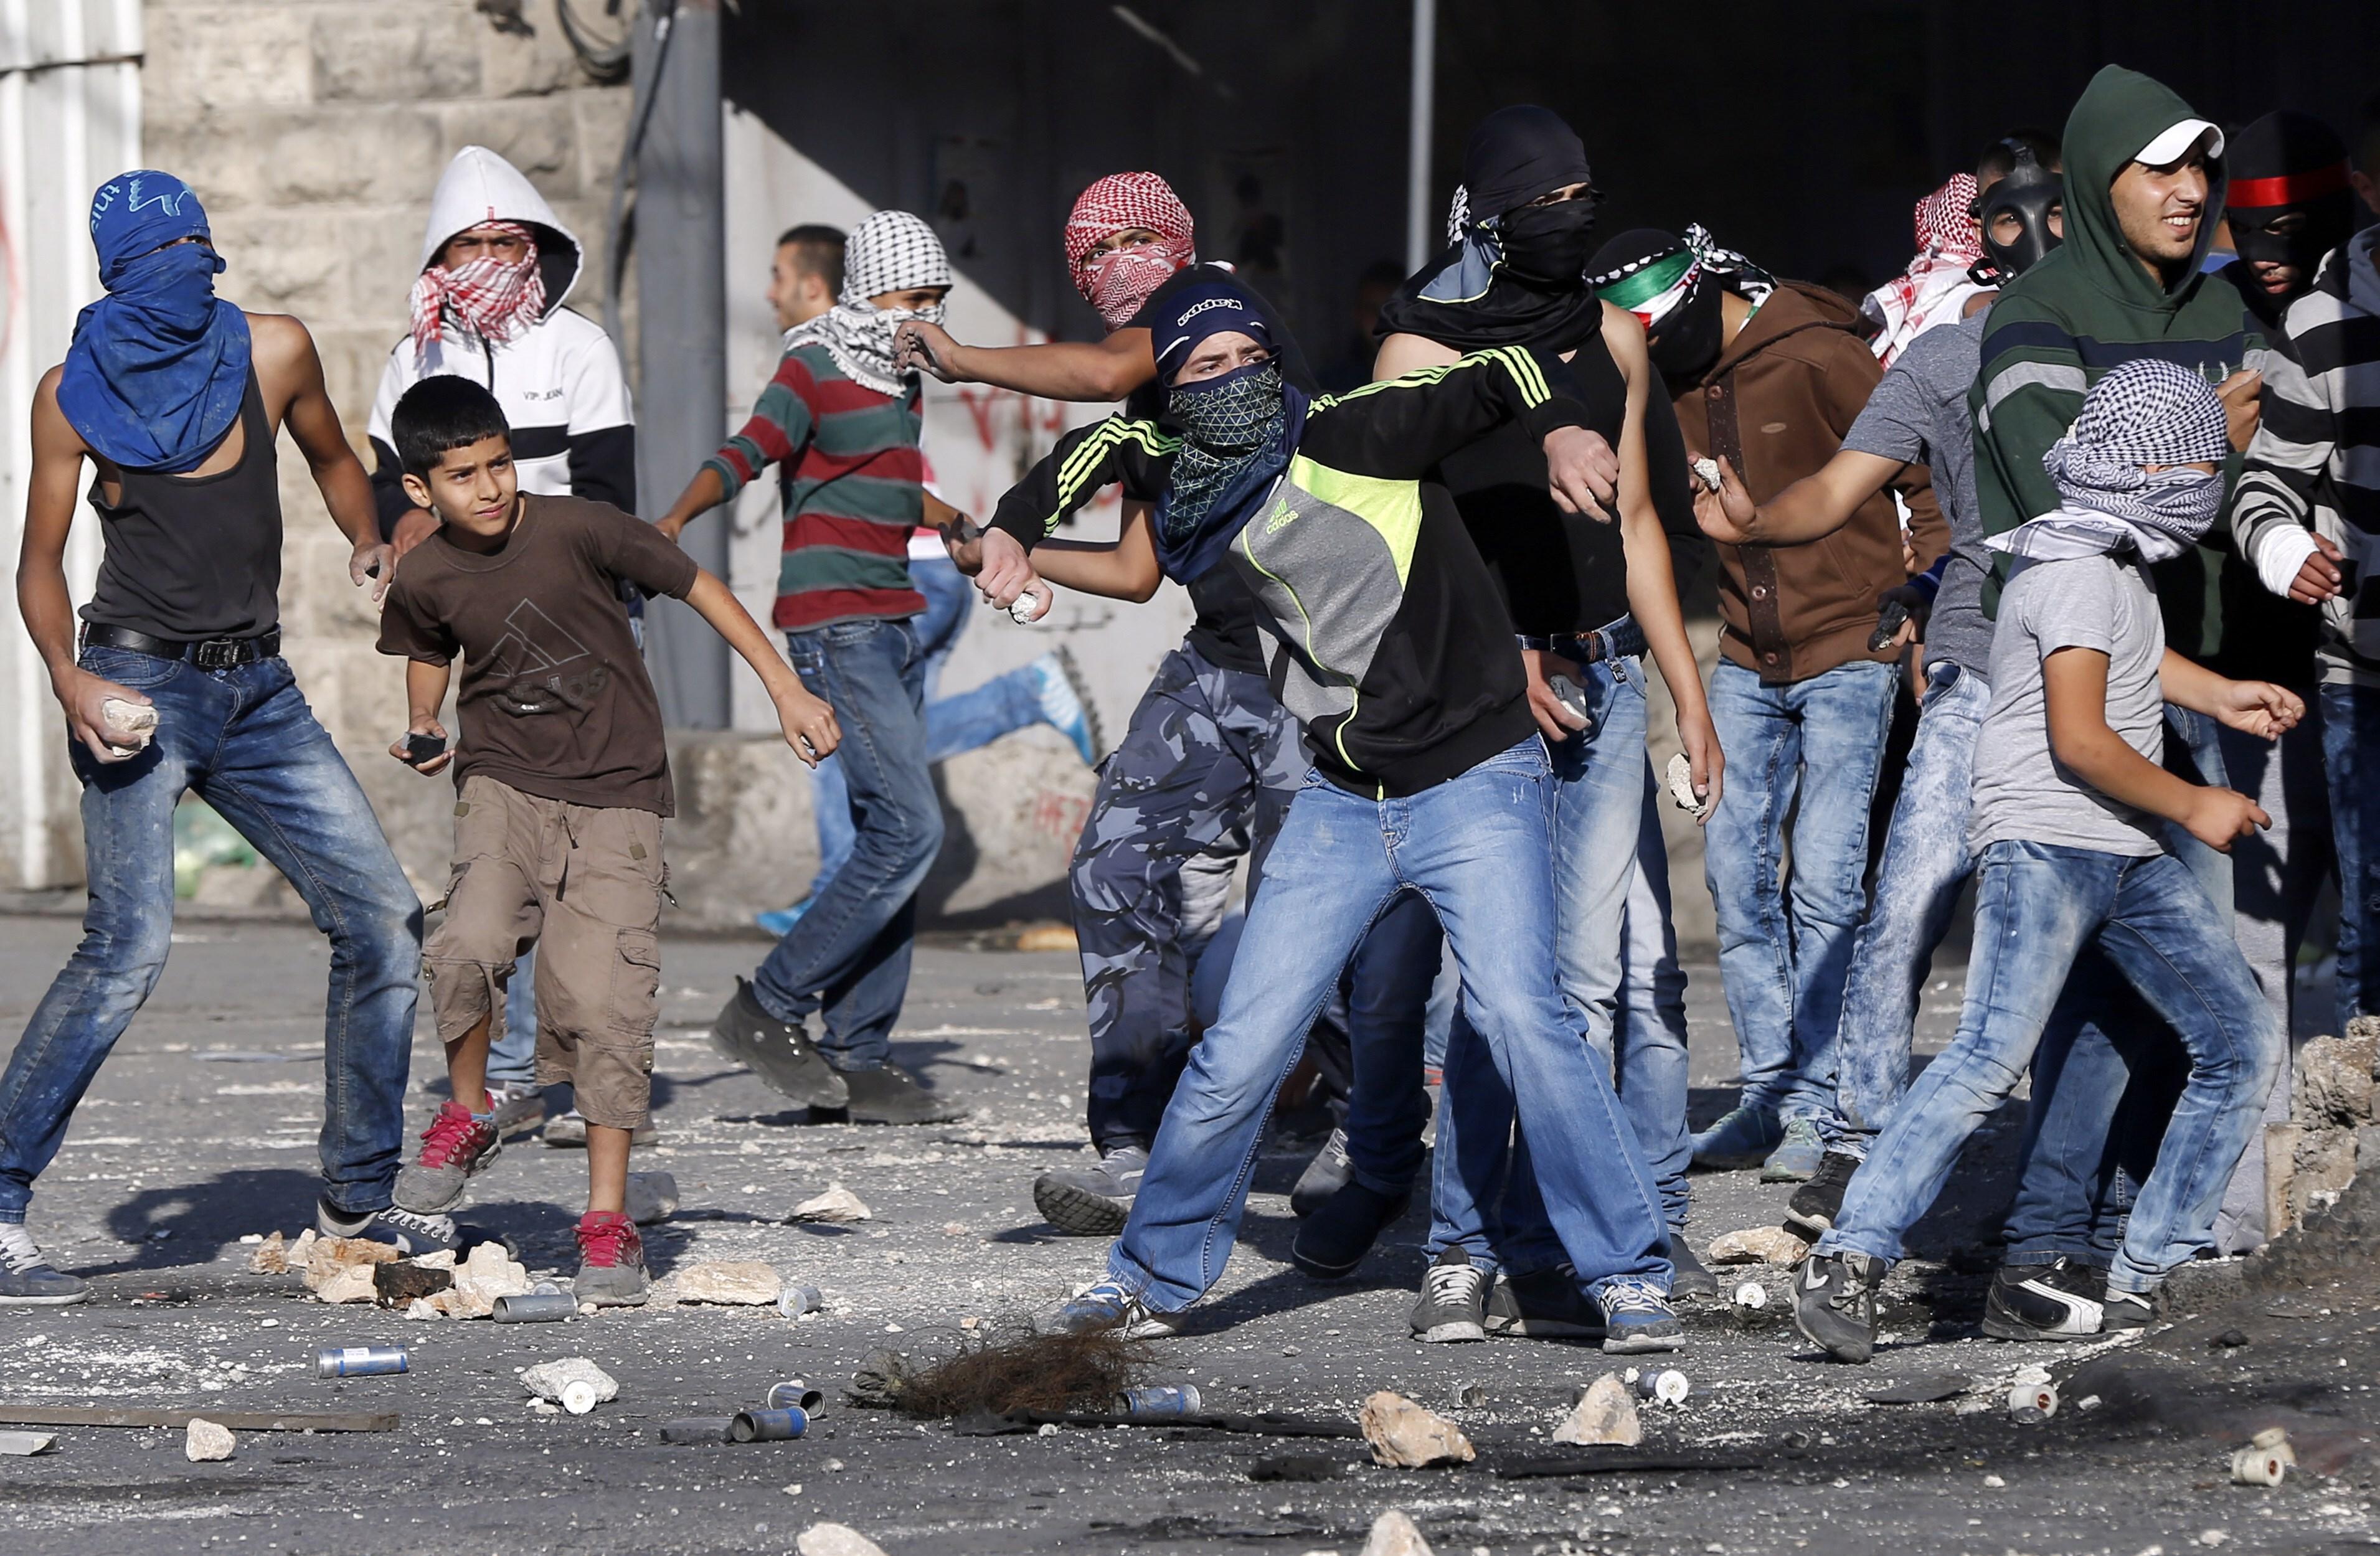 The Media's Palestine Narrative Reads Like Fan Fiction